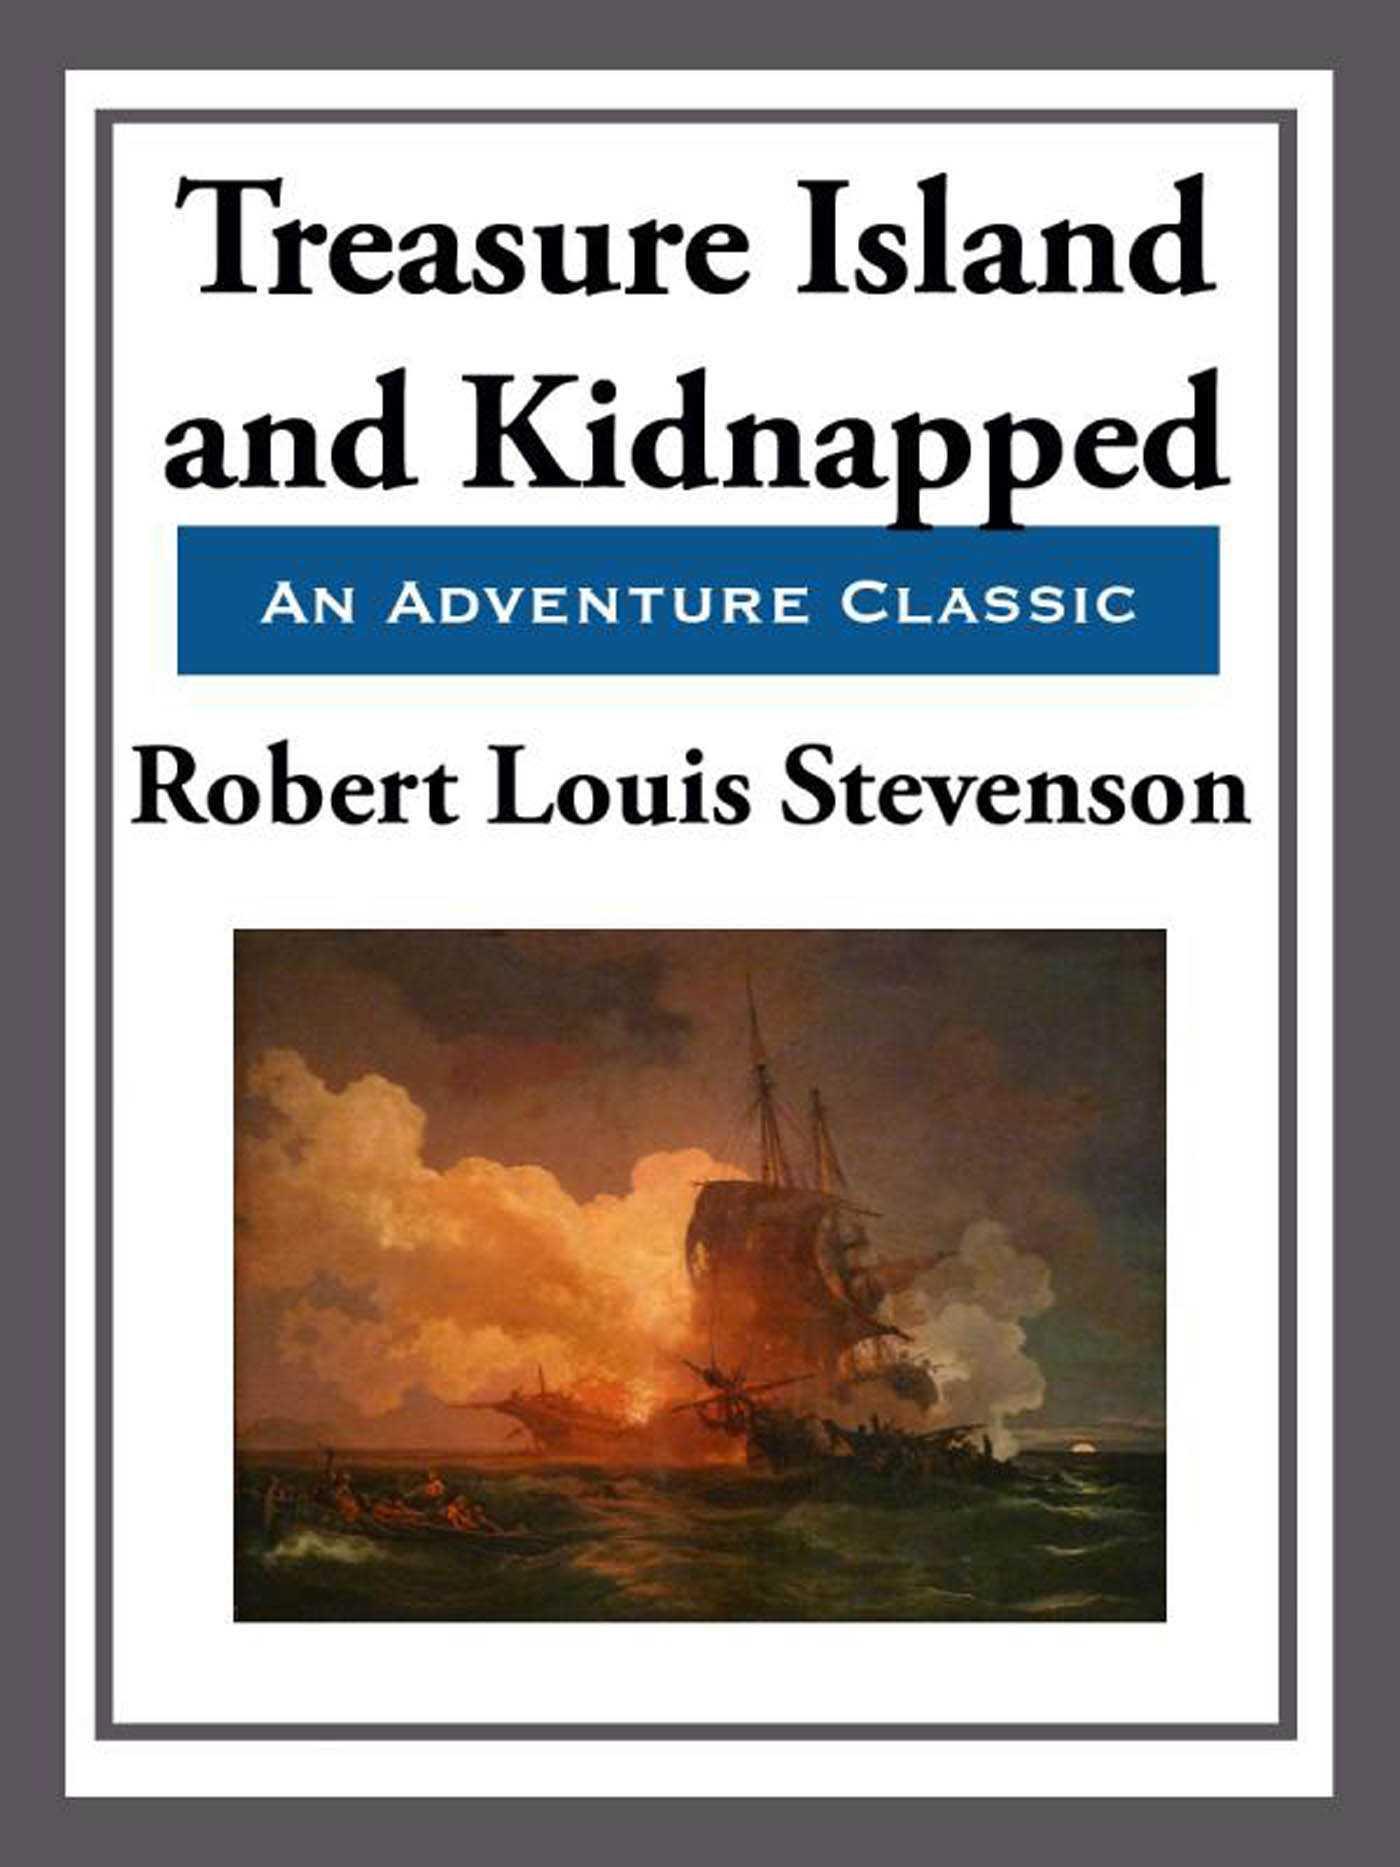 Treasure island kidnapped 9781627931724 hr